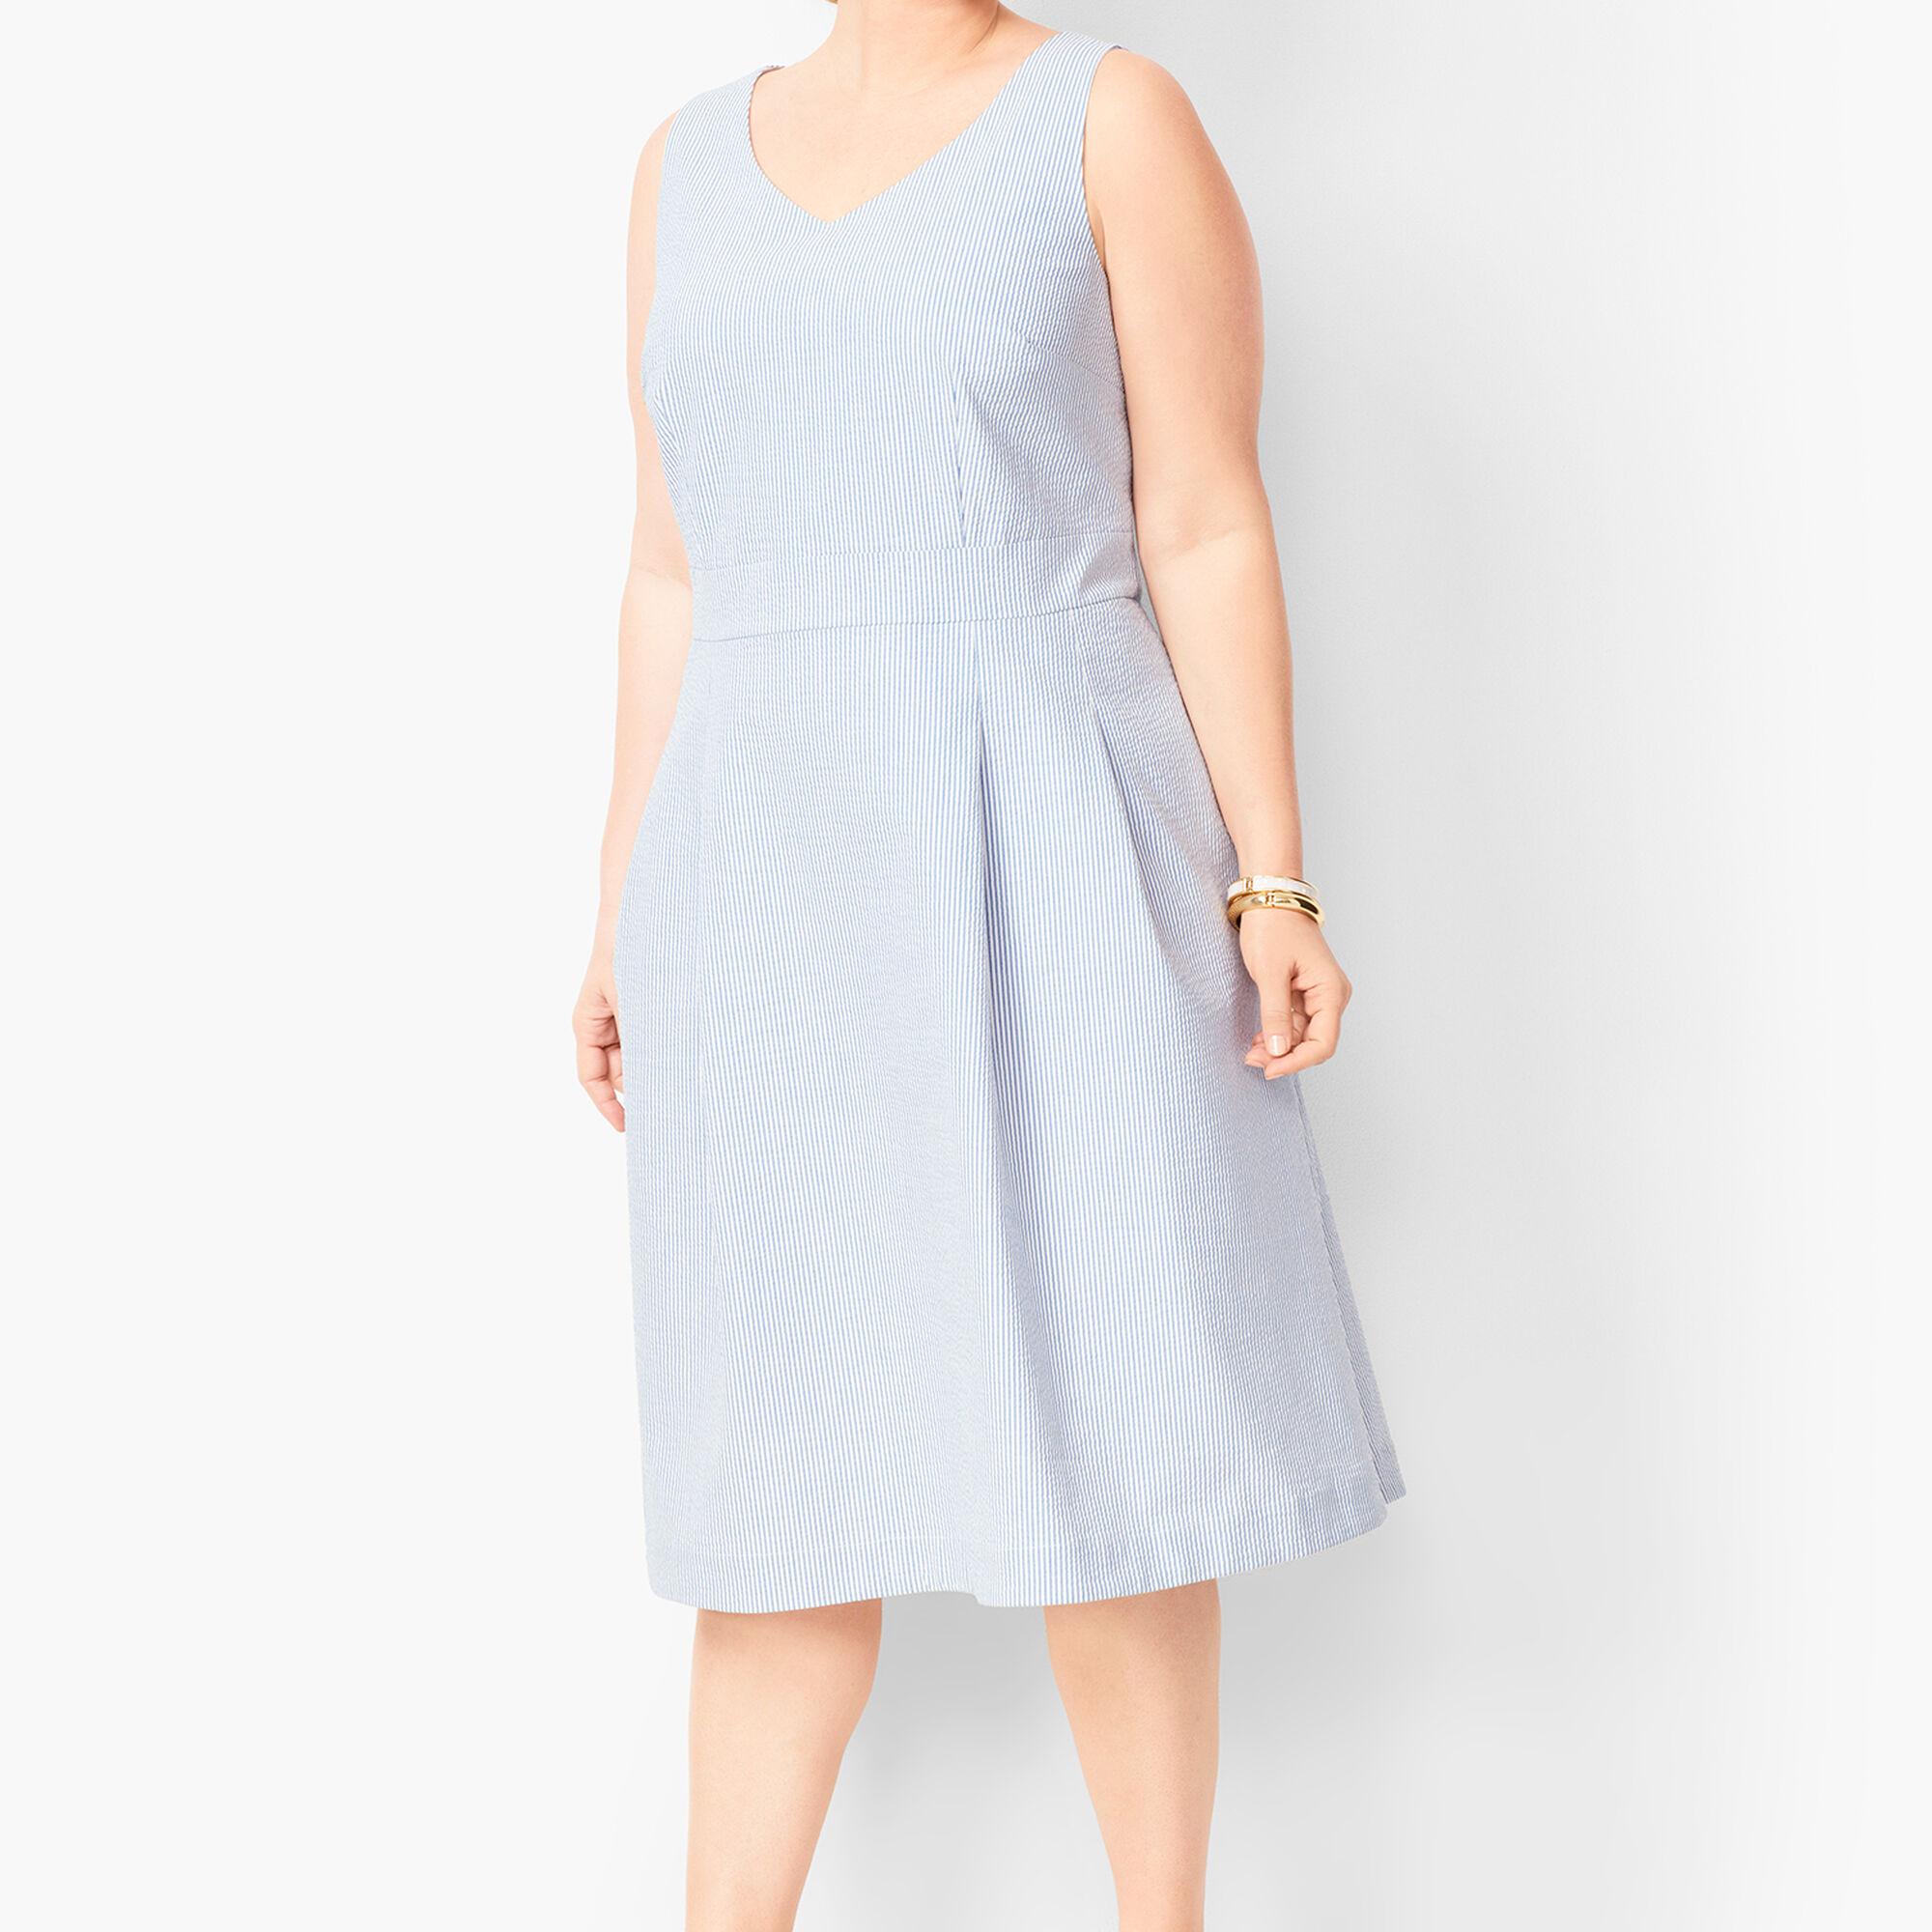 915553bed3 Lightweight Seersucker Fit & Flare Dress